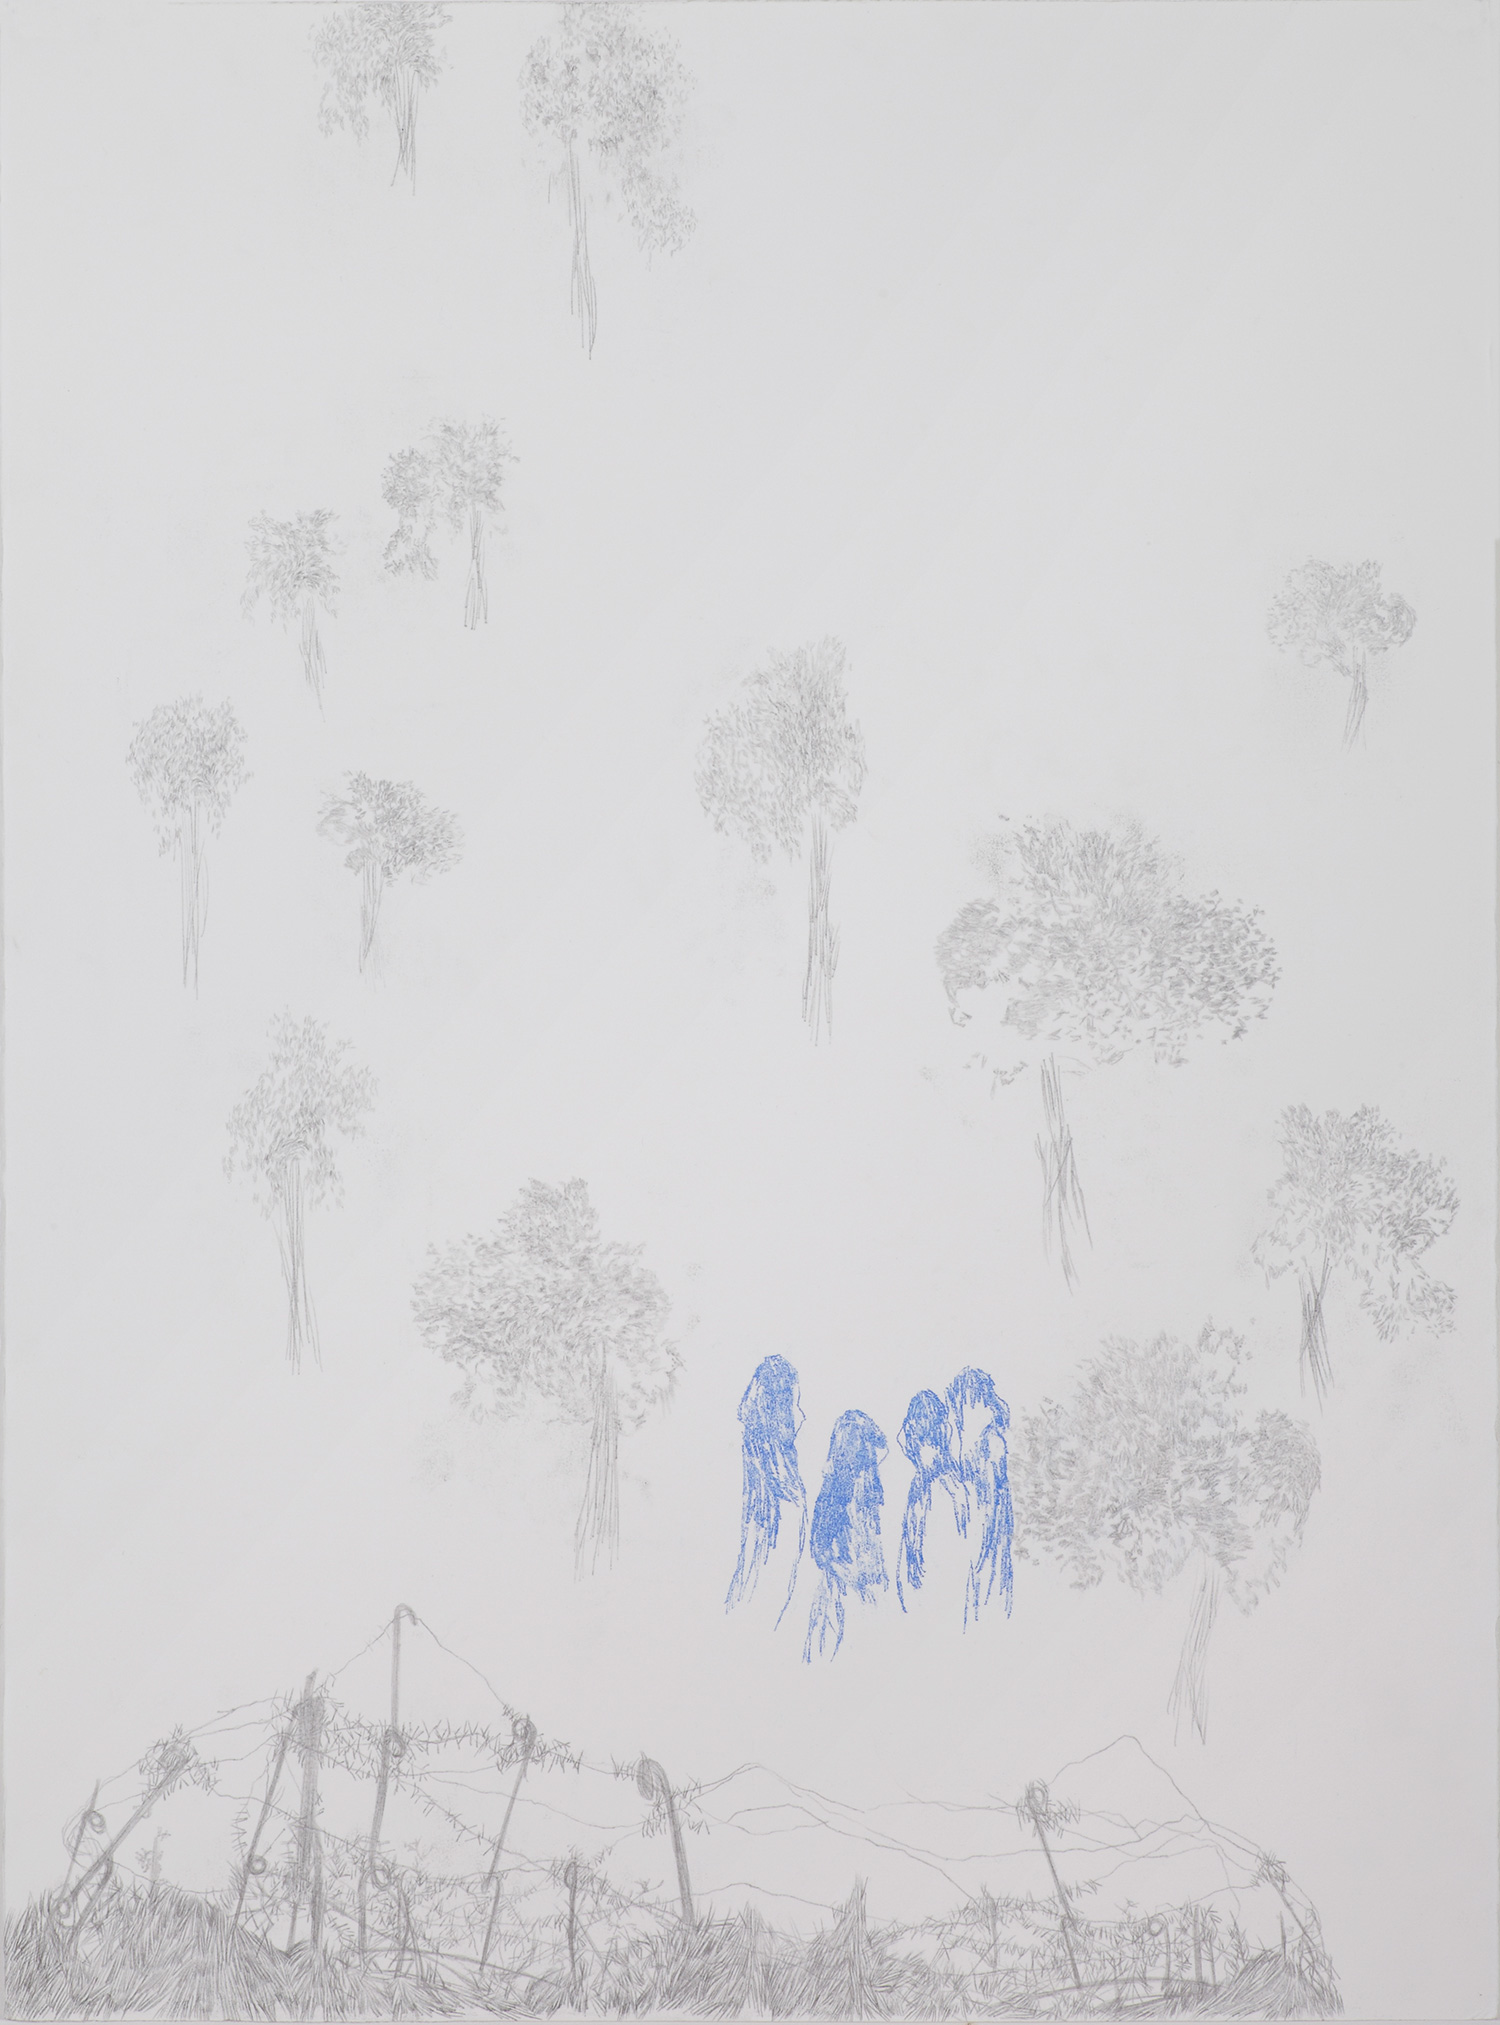 <i>Rituel</i>, 2013, graphite et crayon, 80x60cm